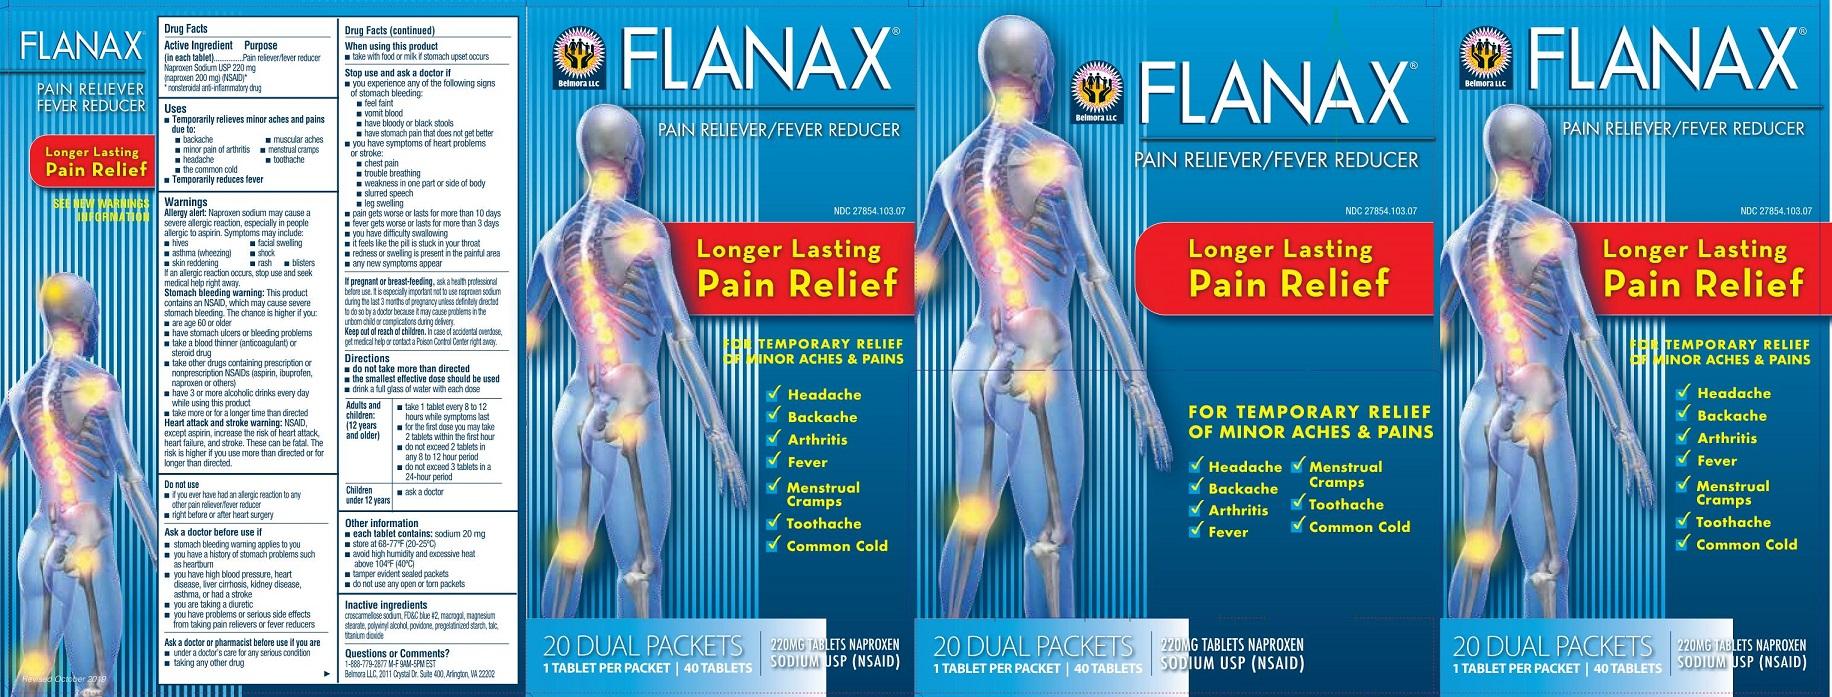 FlanaxPain